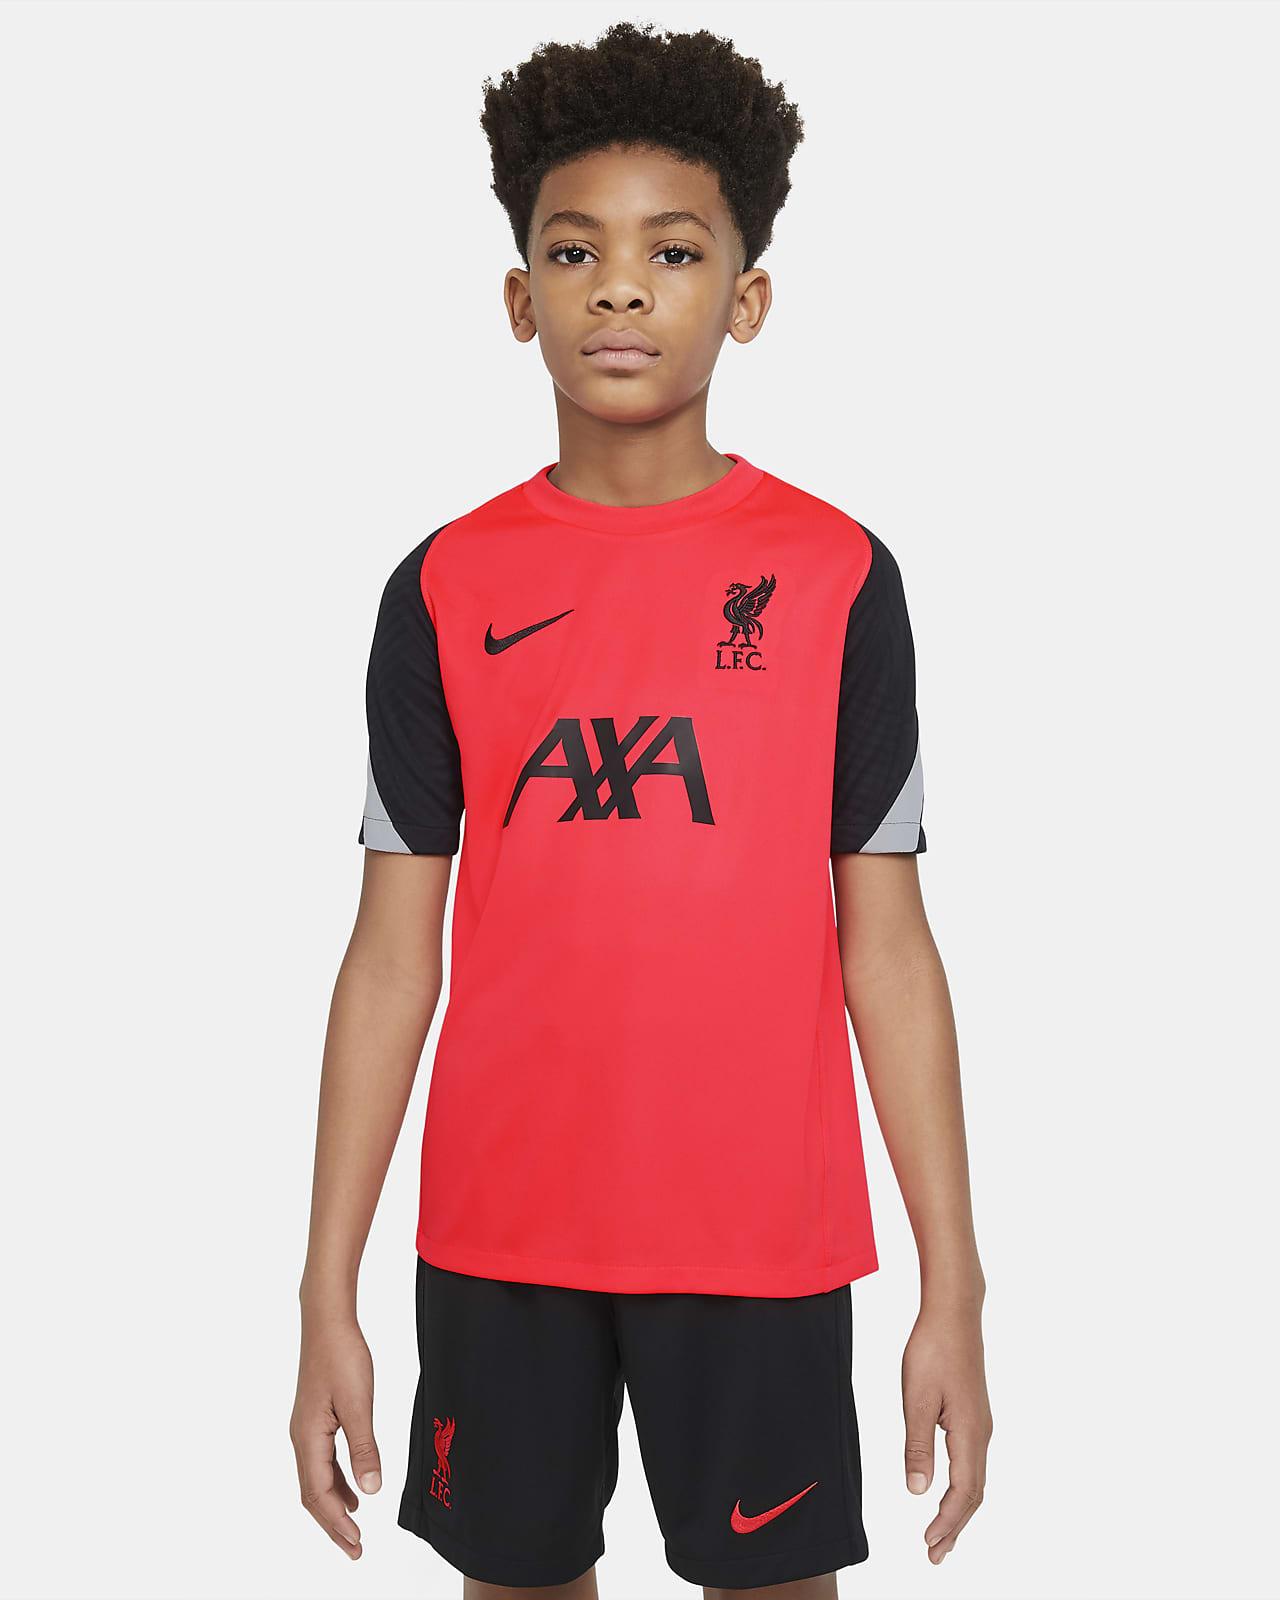 Liverpool F.C. Strike Older Kids' Short-Sleeve Football Top